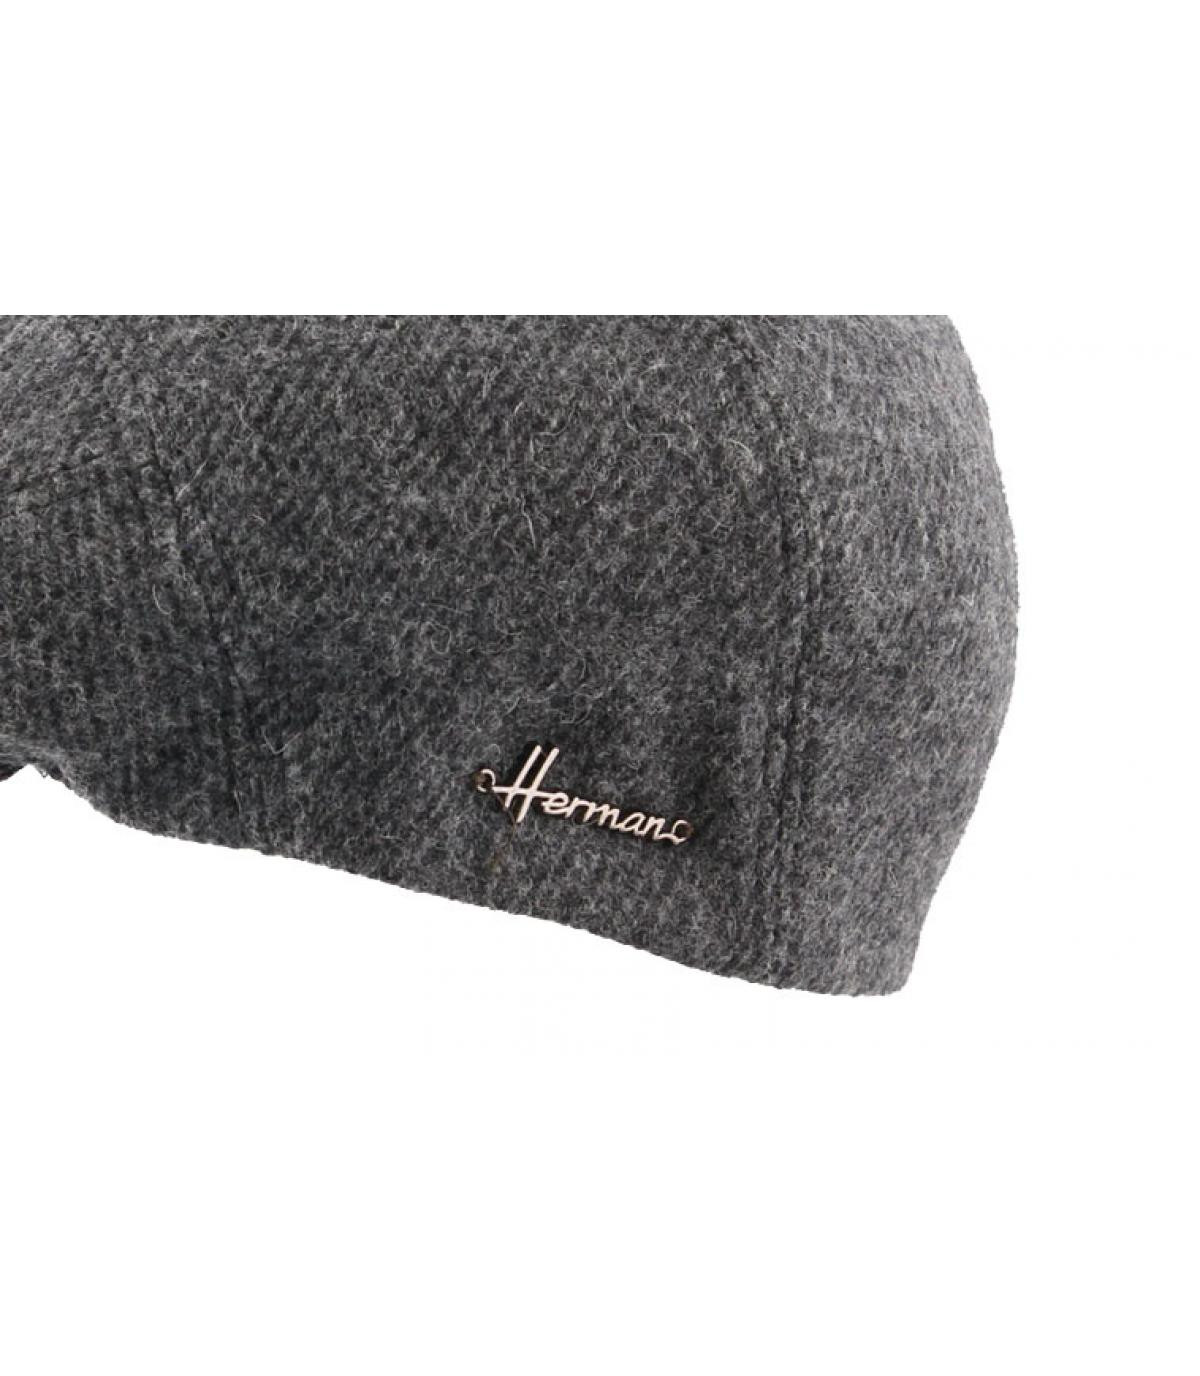 Details Barents Wool Corduroy grey - Abbildung 3